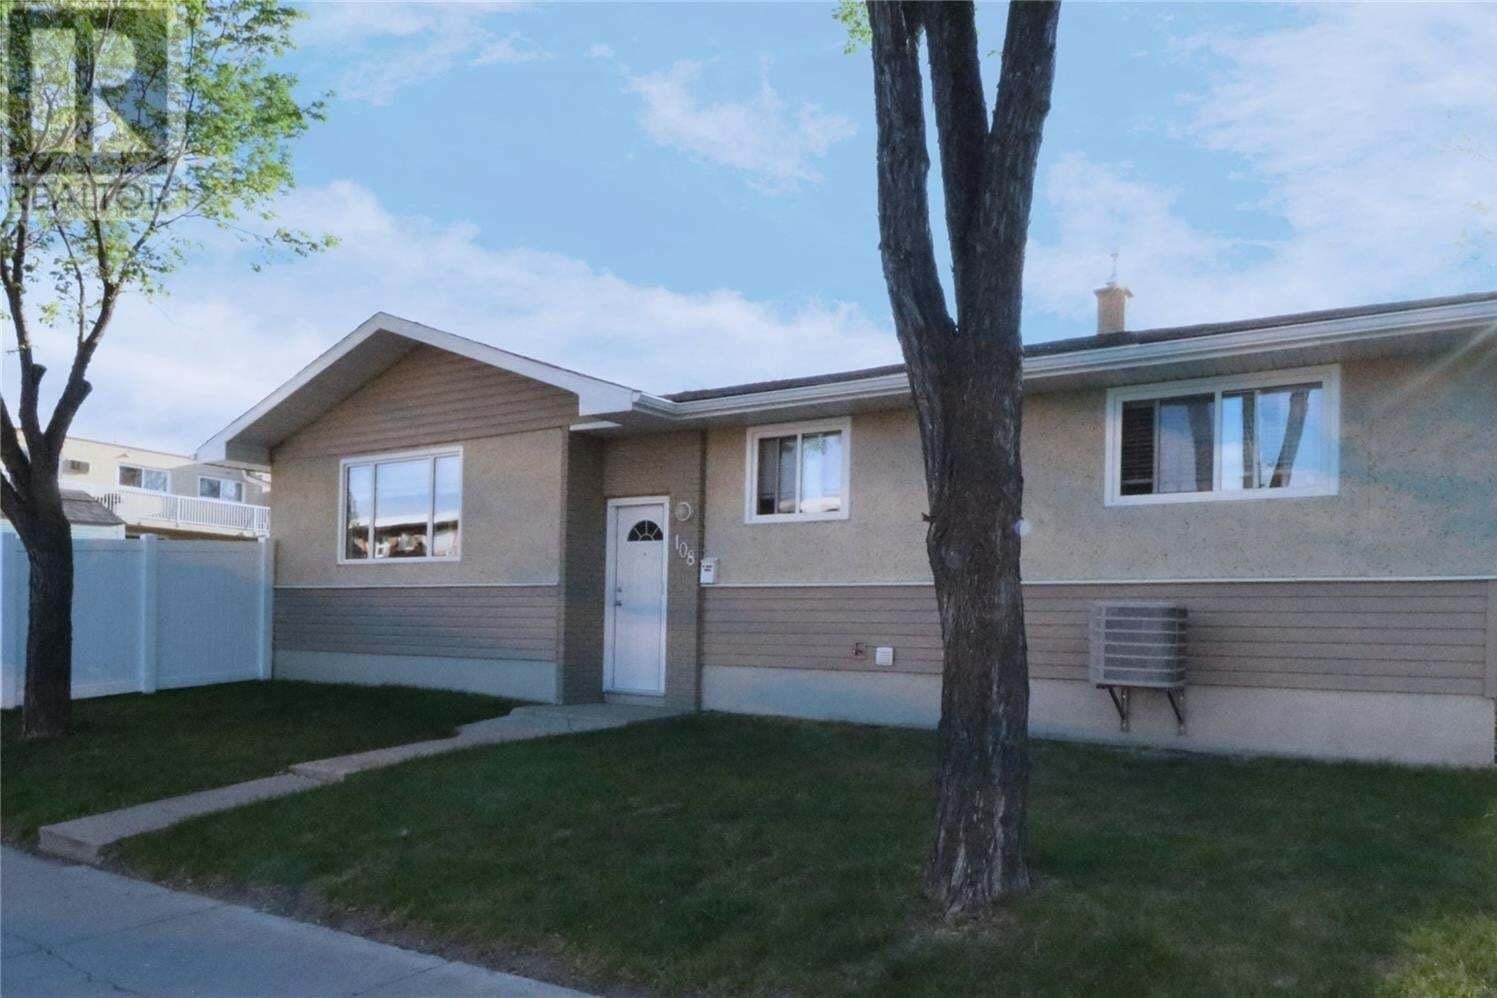 House for sale at 108 Angus Rd Regina Saskatchewan - MLS: SK809696